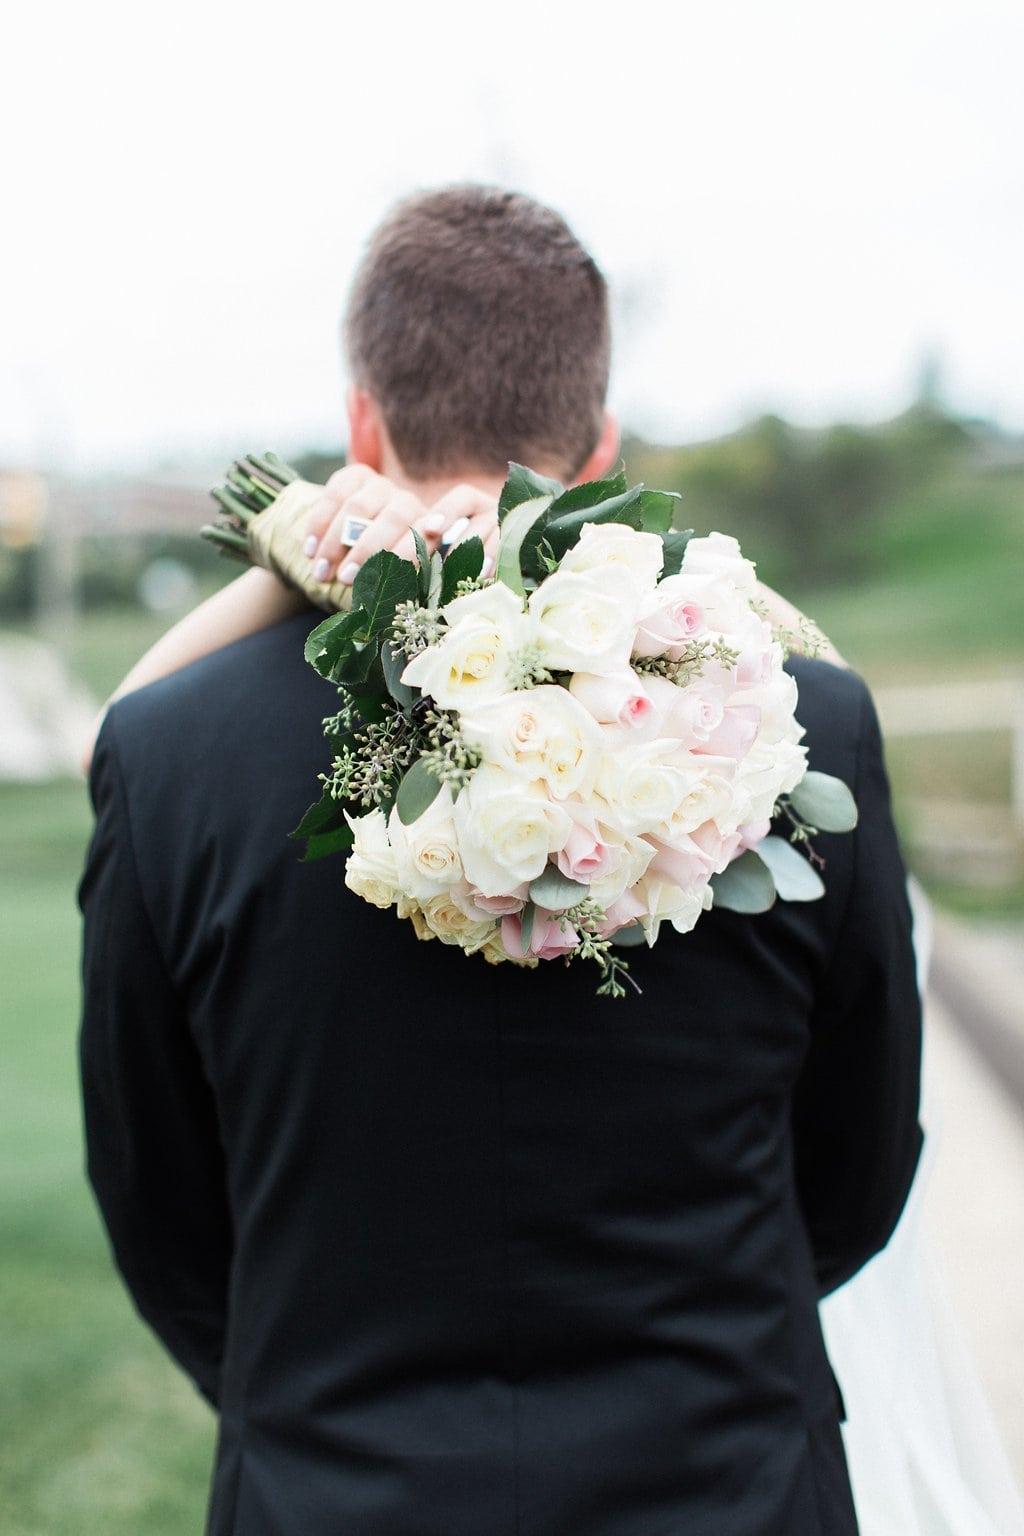 Bride putting her hands over the groom's shoulders with her bouquet